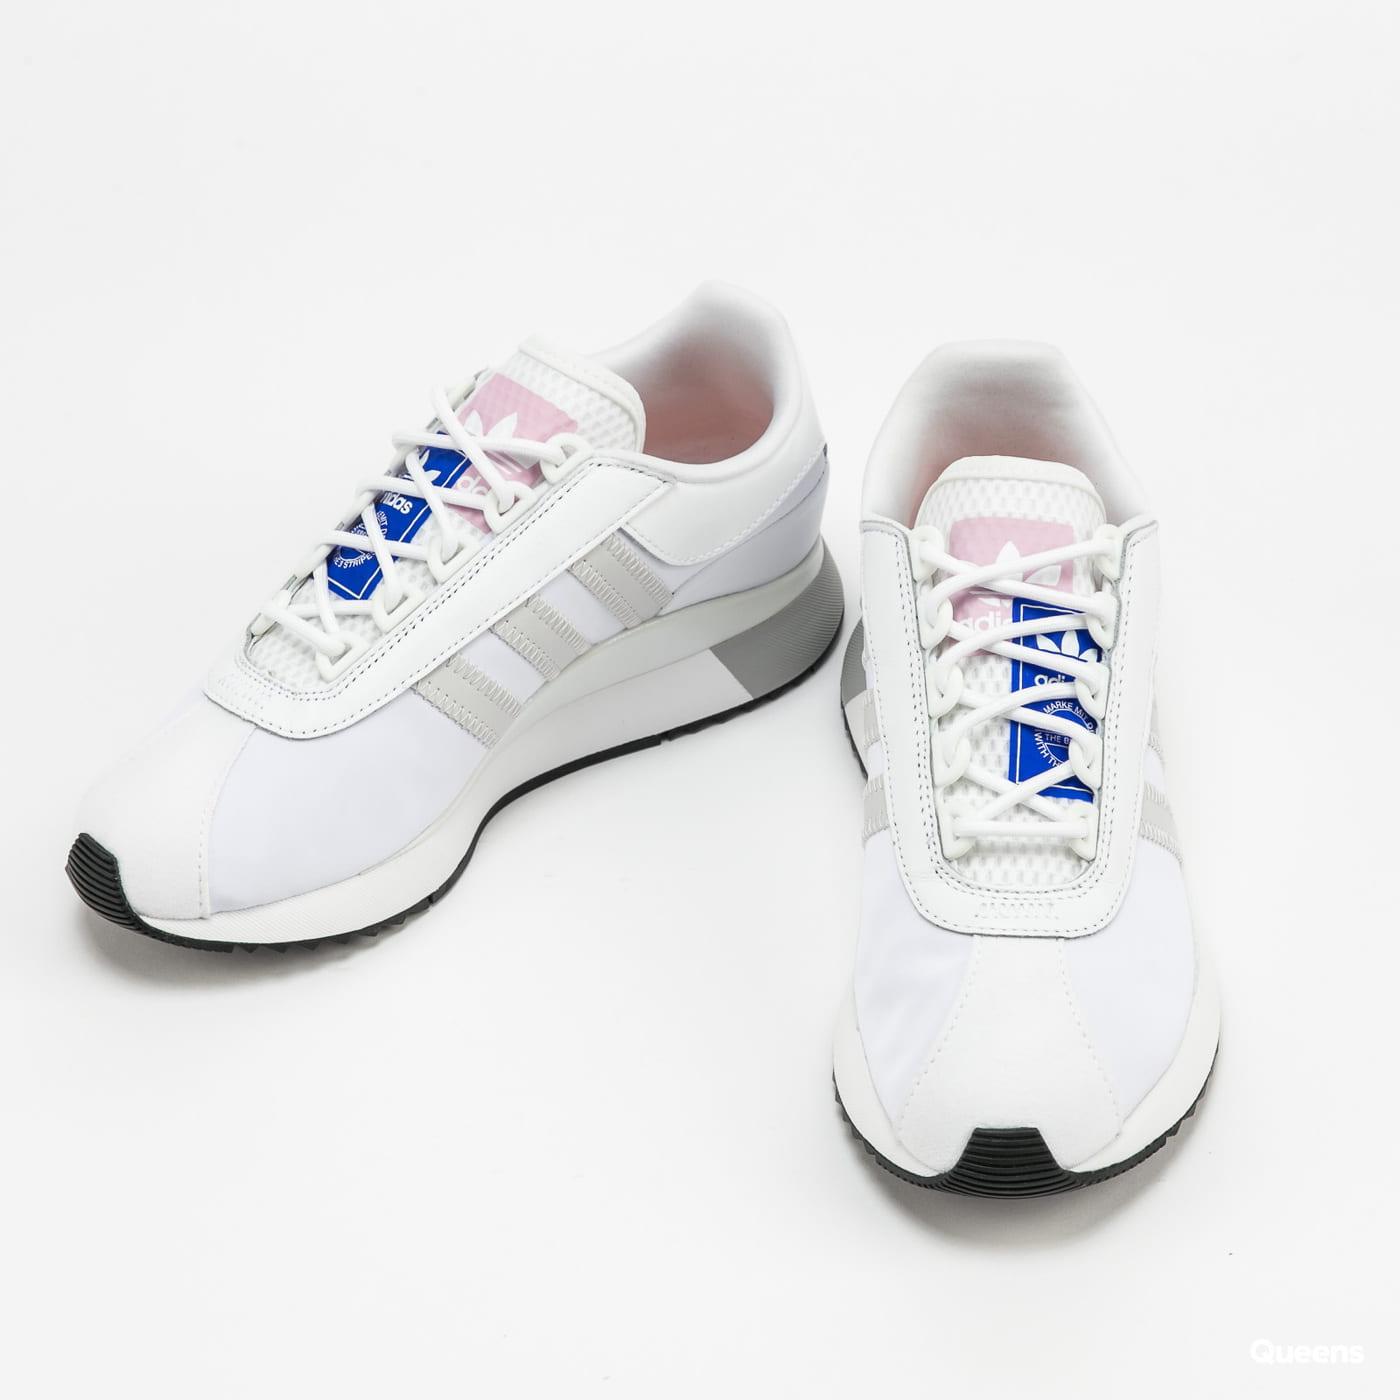 adidas Originals SL Andridge W ftwwht / greone / cblack